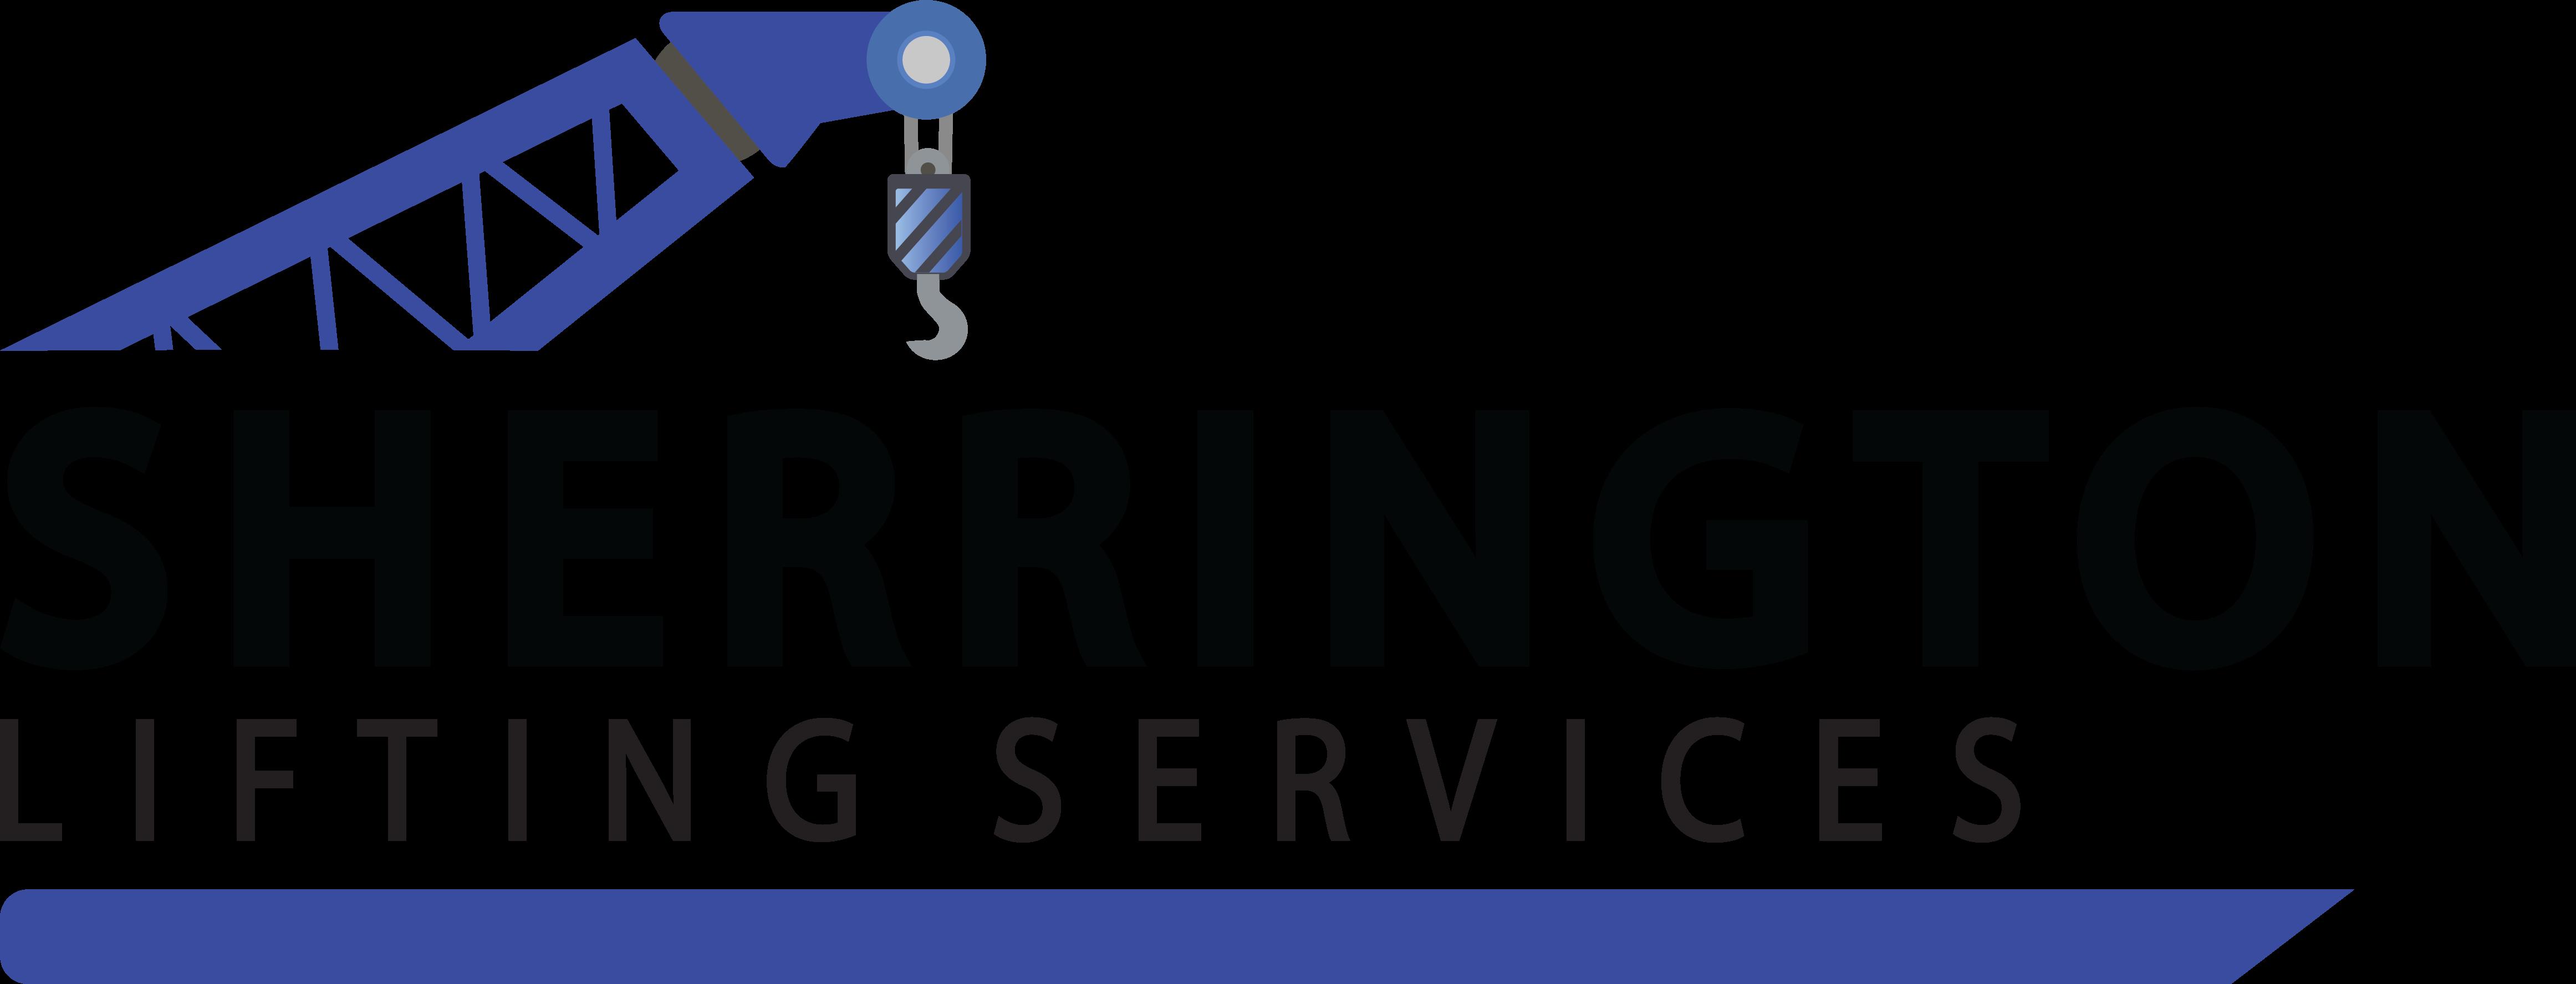 Sherrington Lifting